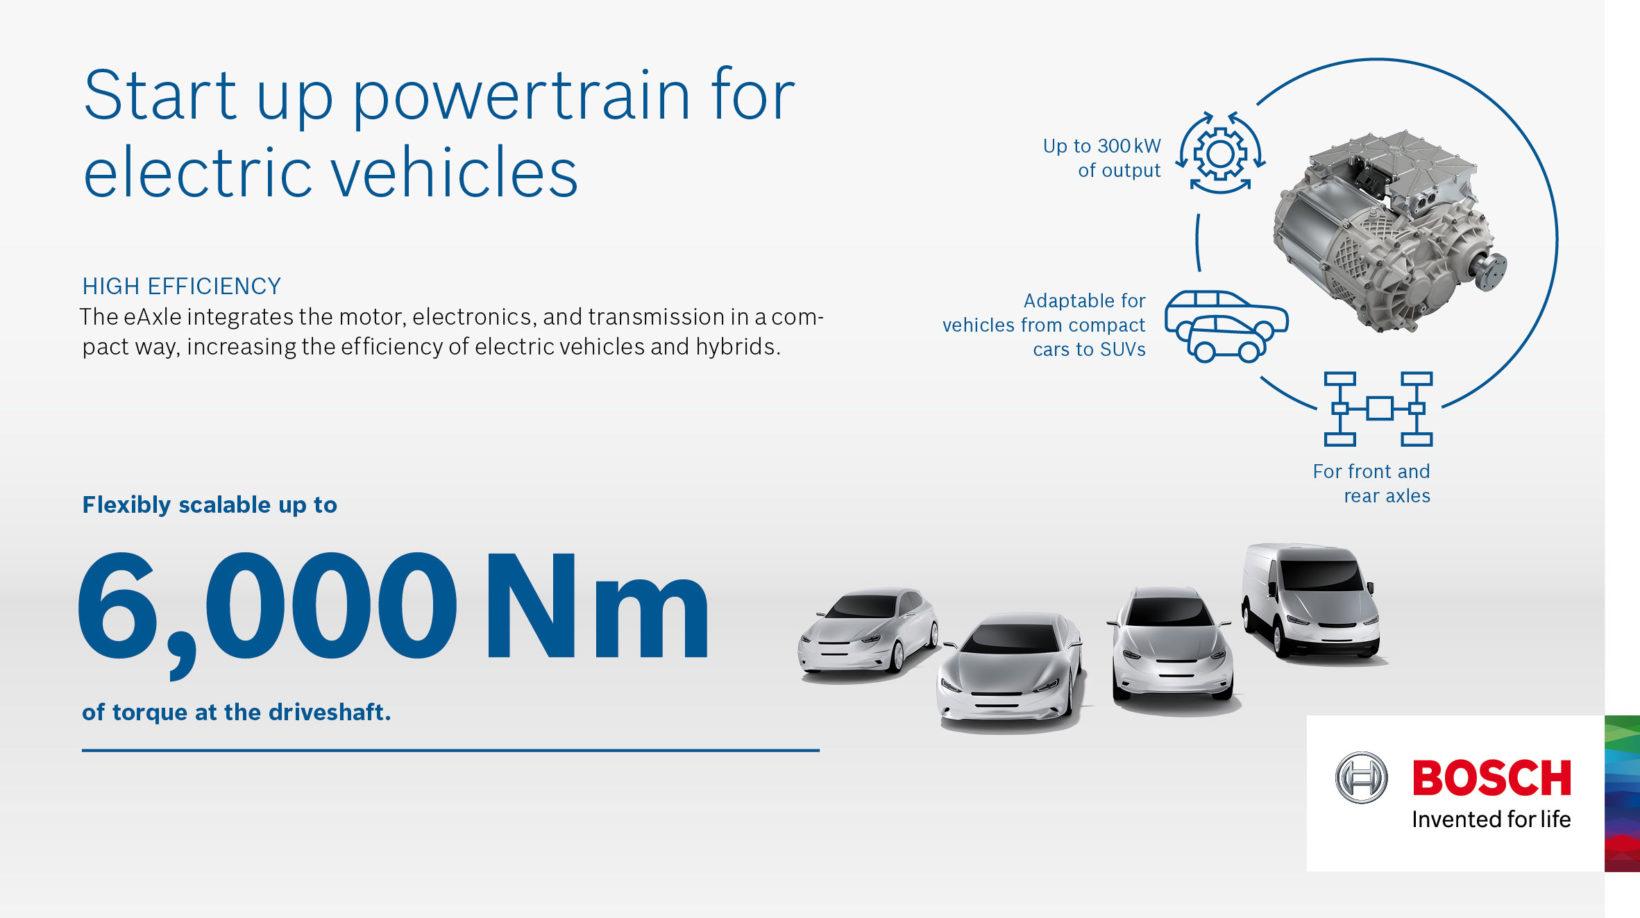 Bosch PowerTrain